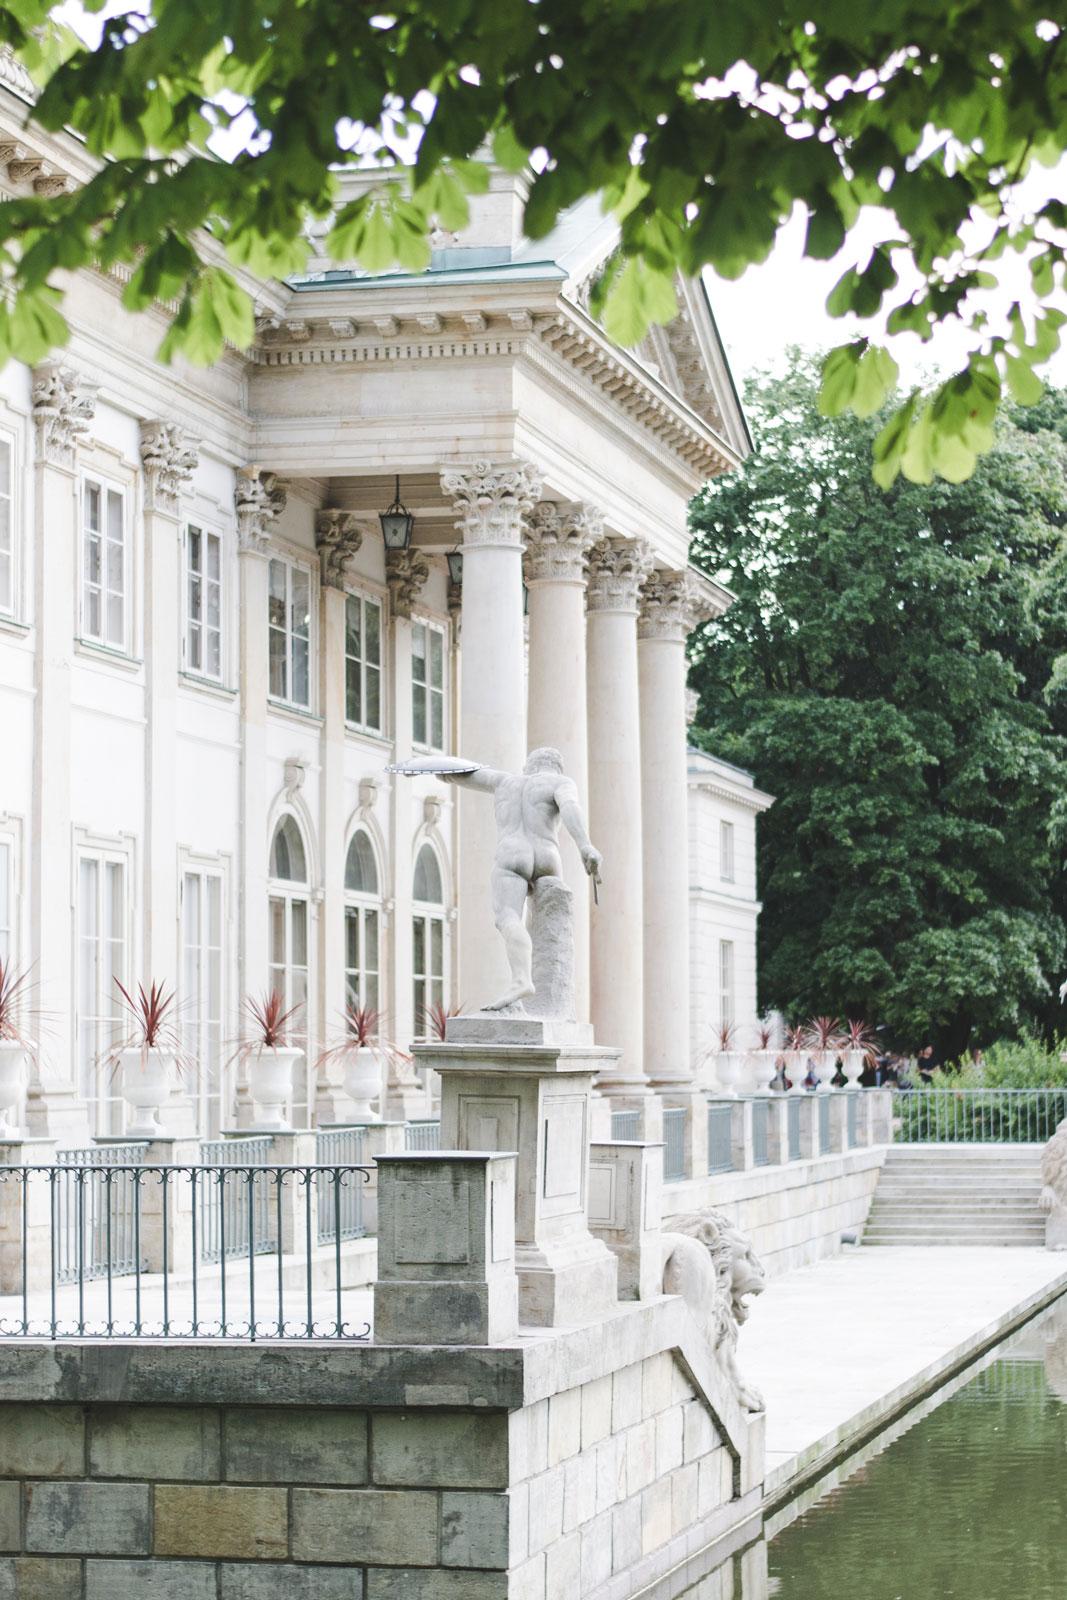 Palace-on-the-Isle-Warsaw-Lazienki-Park